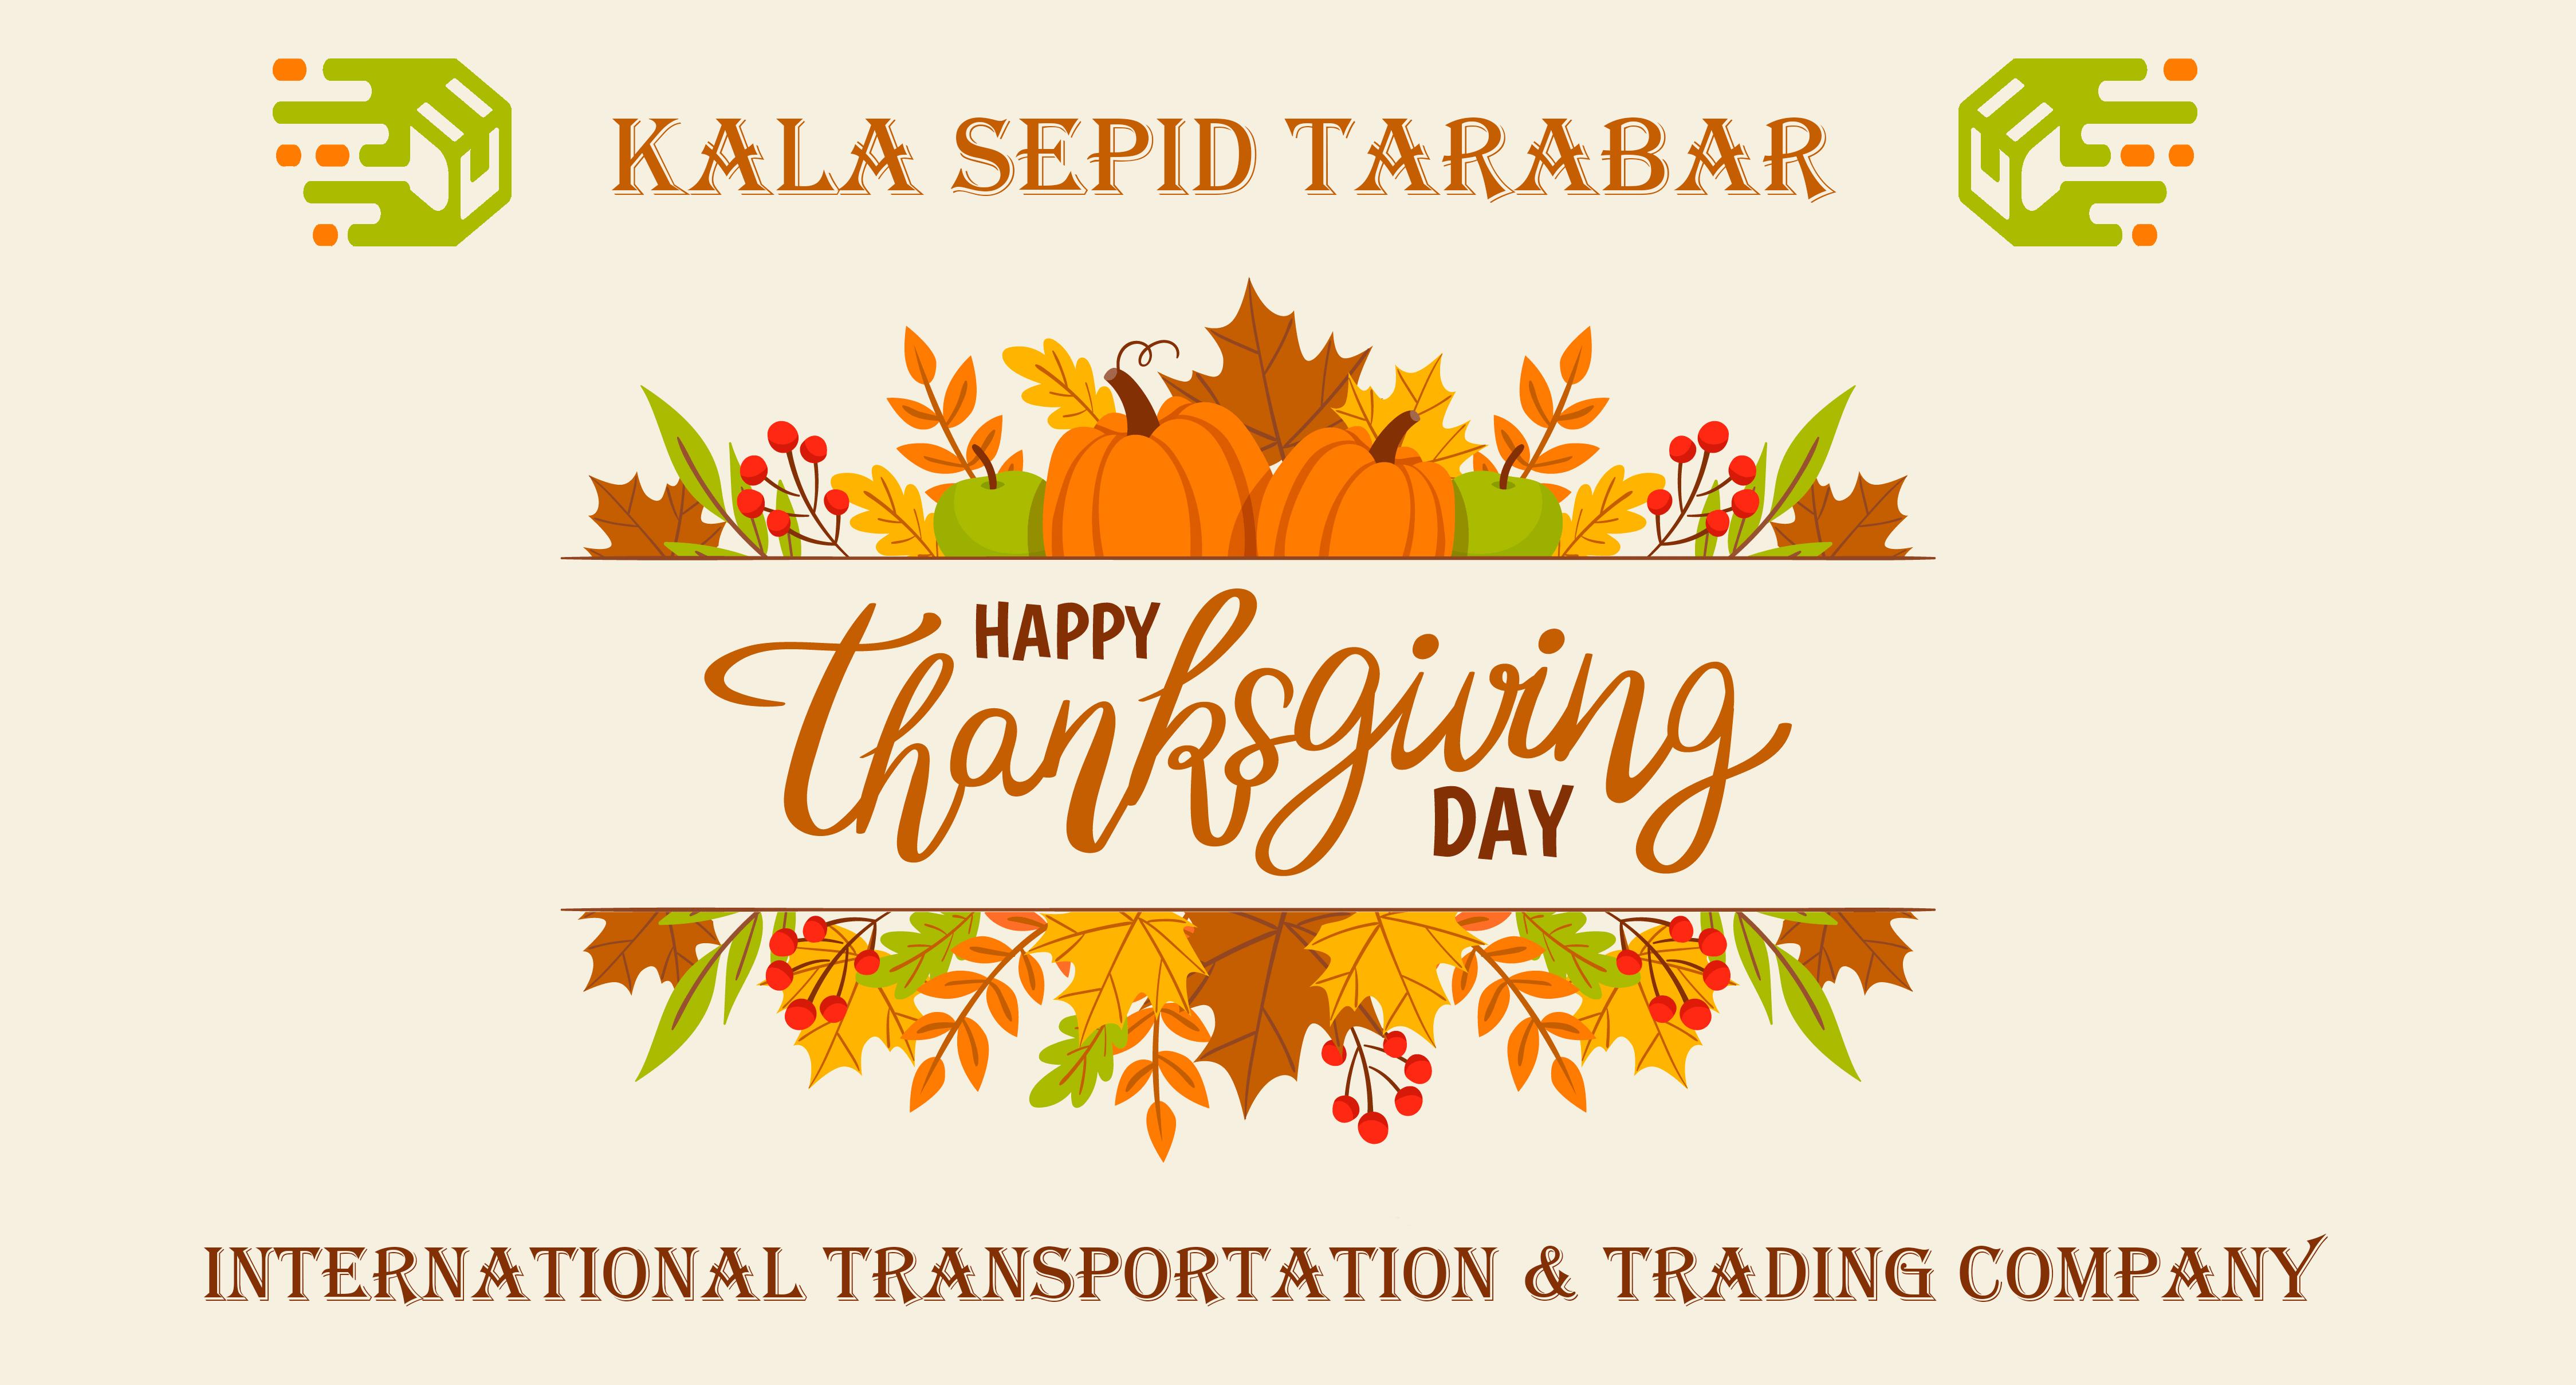 Thanksgiving Day, Happy Thanksgiving Day, Kala Sepid Tarabar, International Transportation and Trading Company